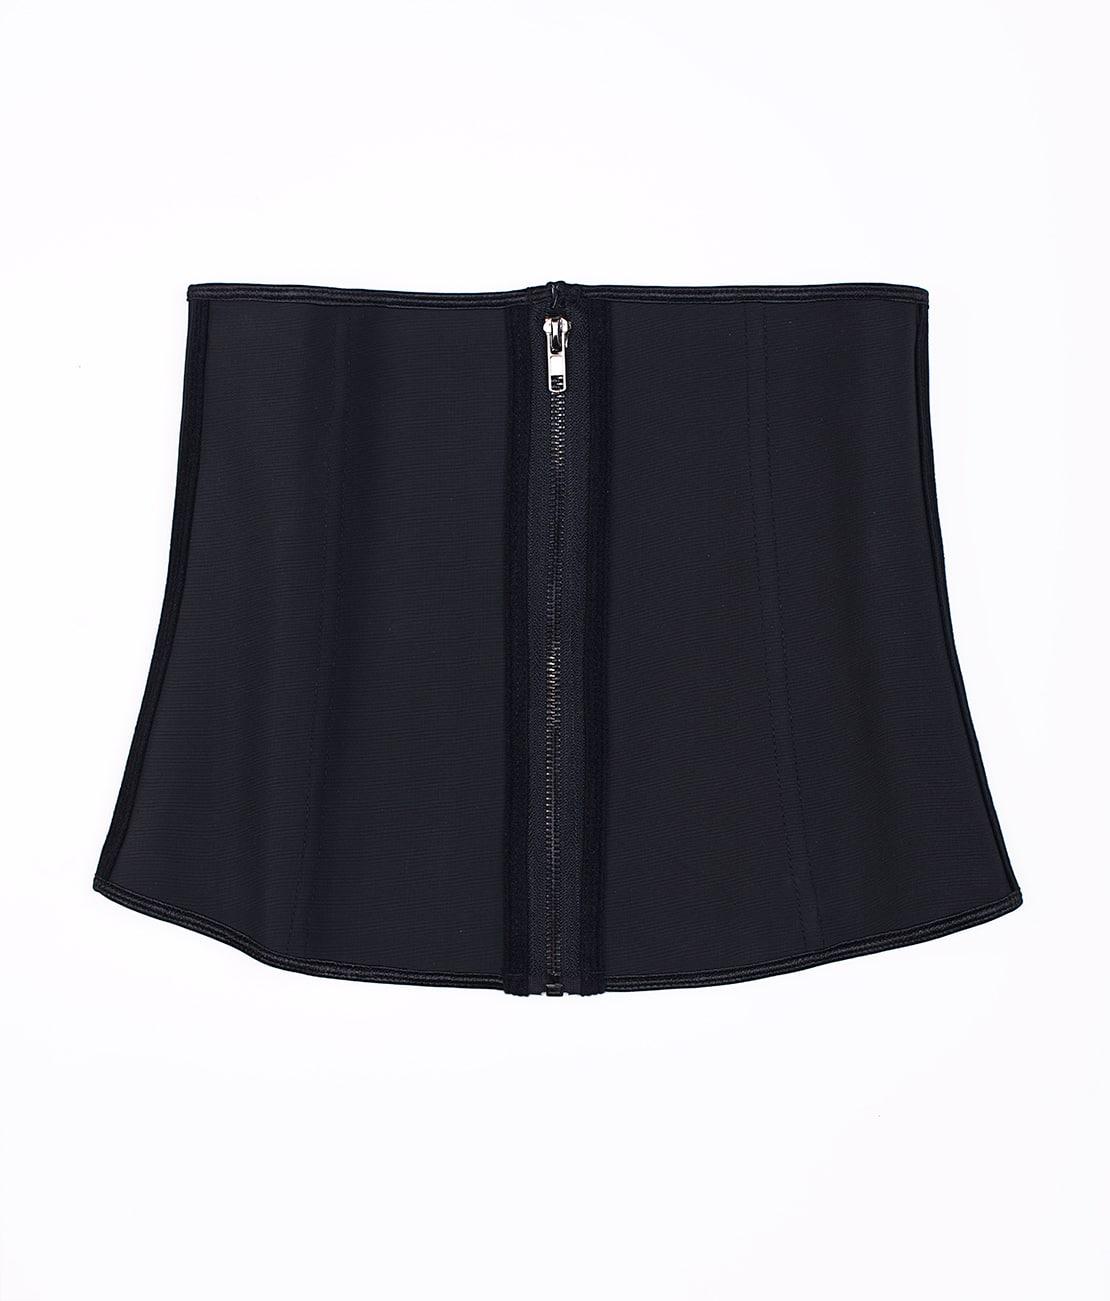 Gaine Femme Noir Packshot Front